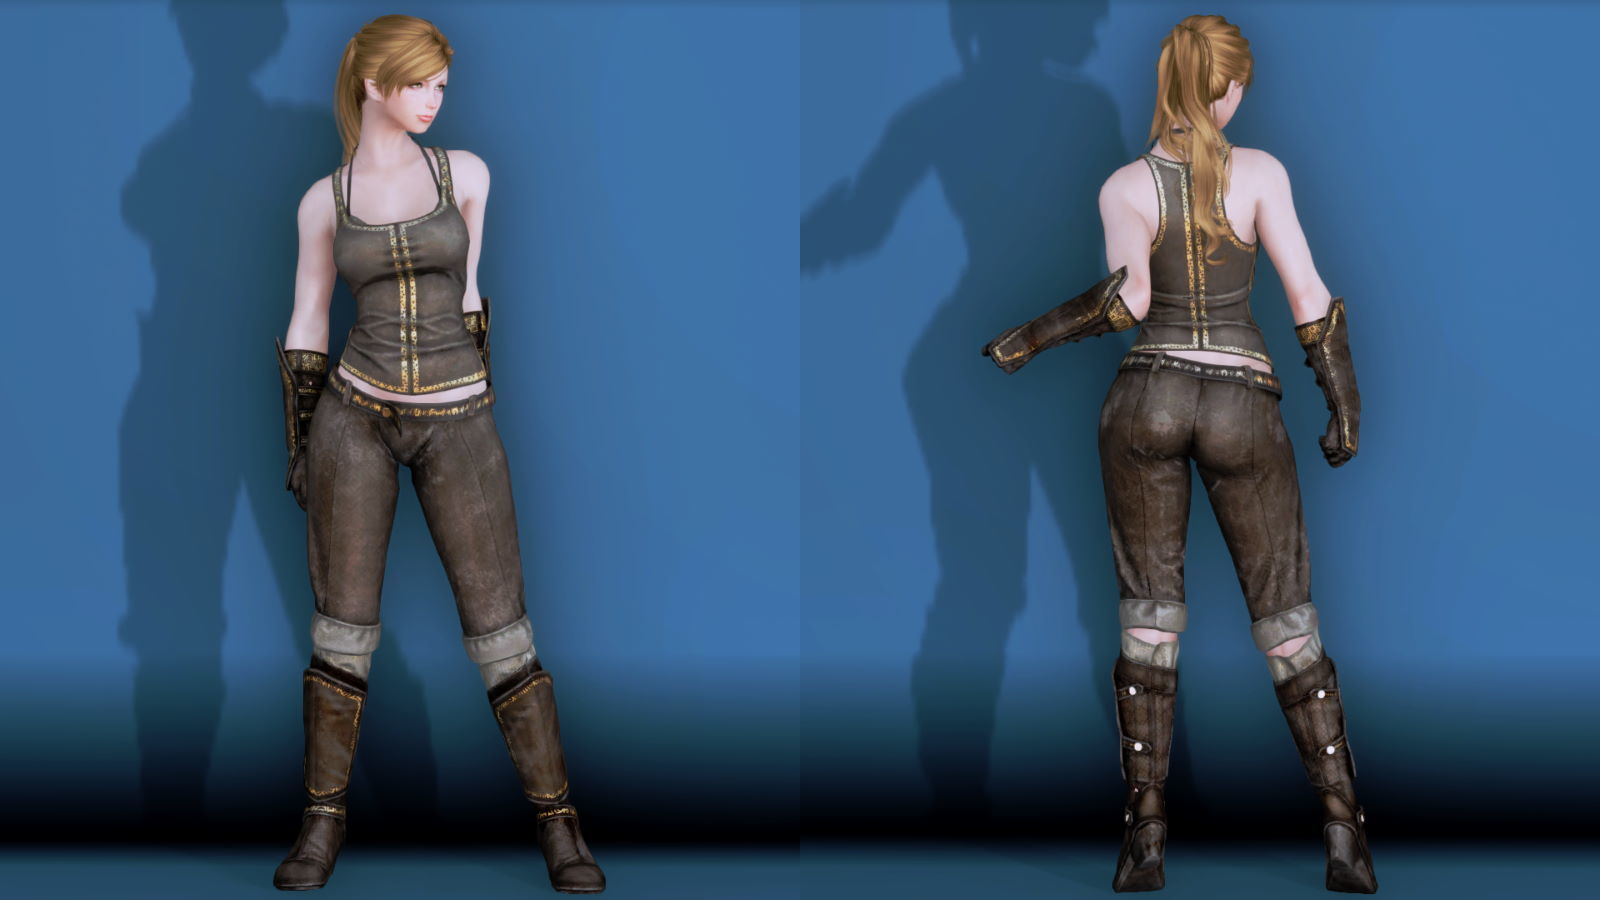 RuggedRogueSSE 241-1 Pose Fu-Ba-F Vest Trouser W 2